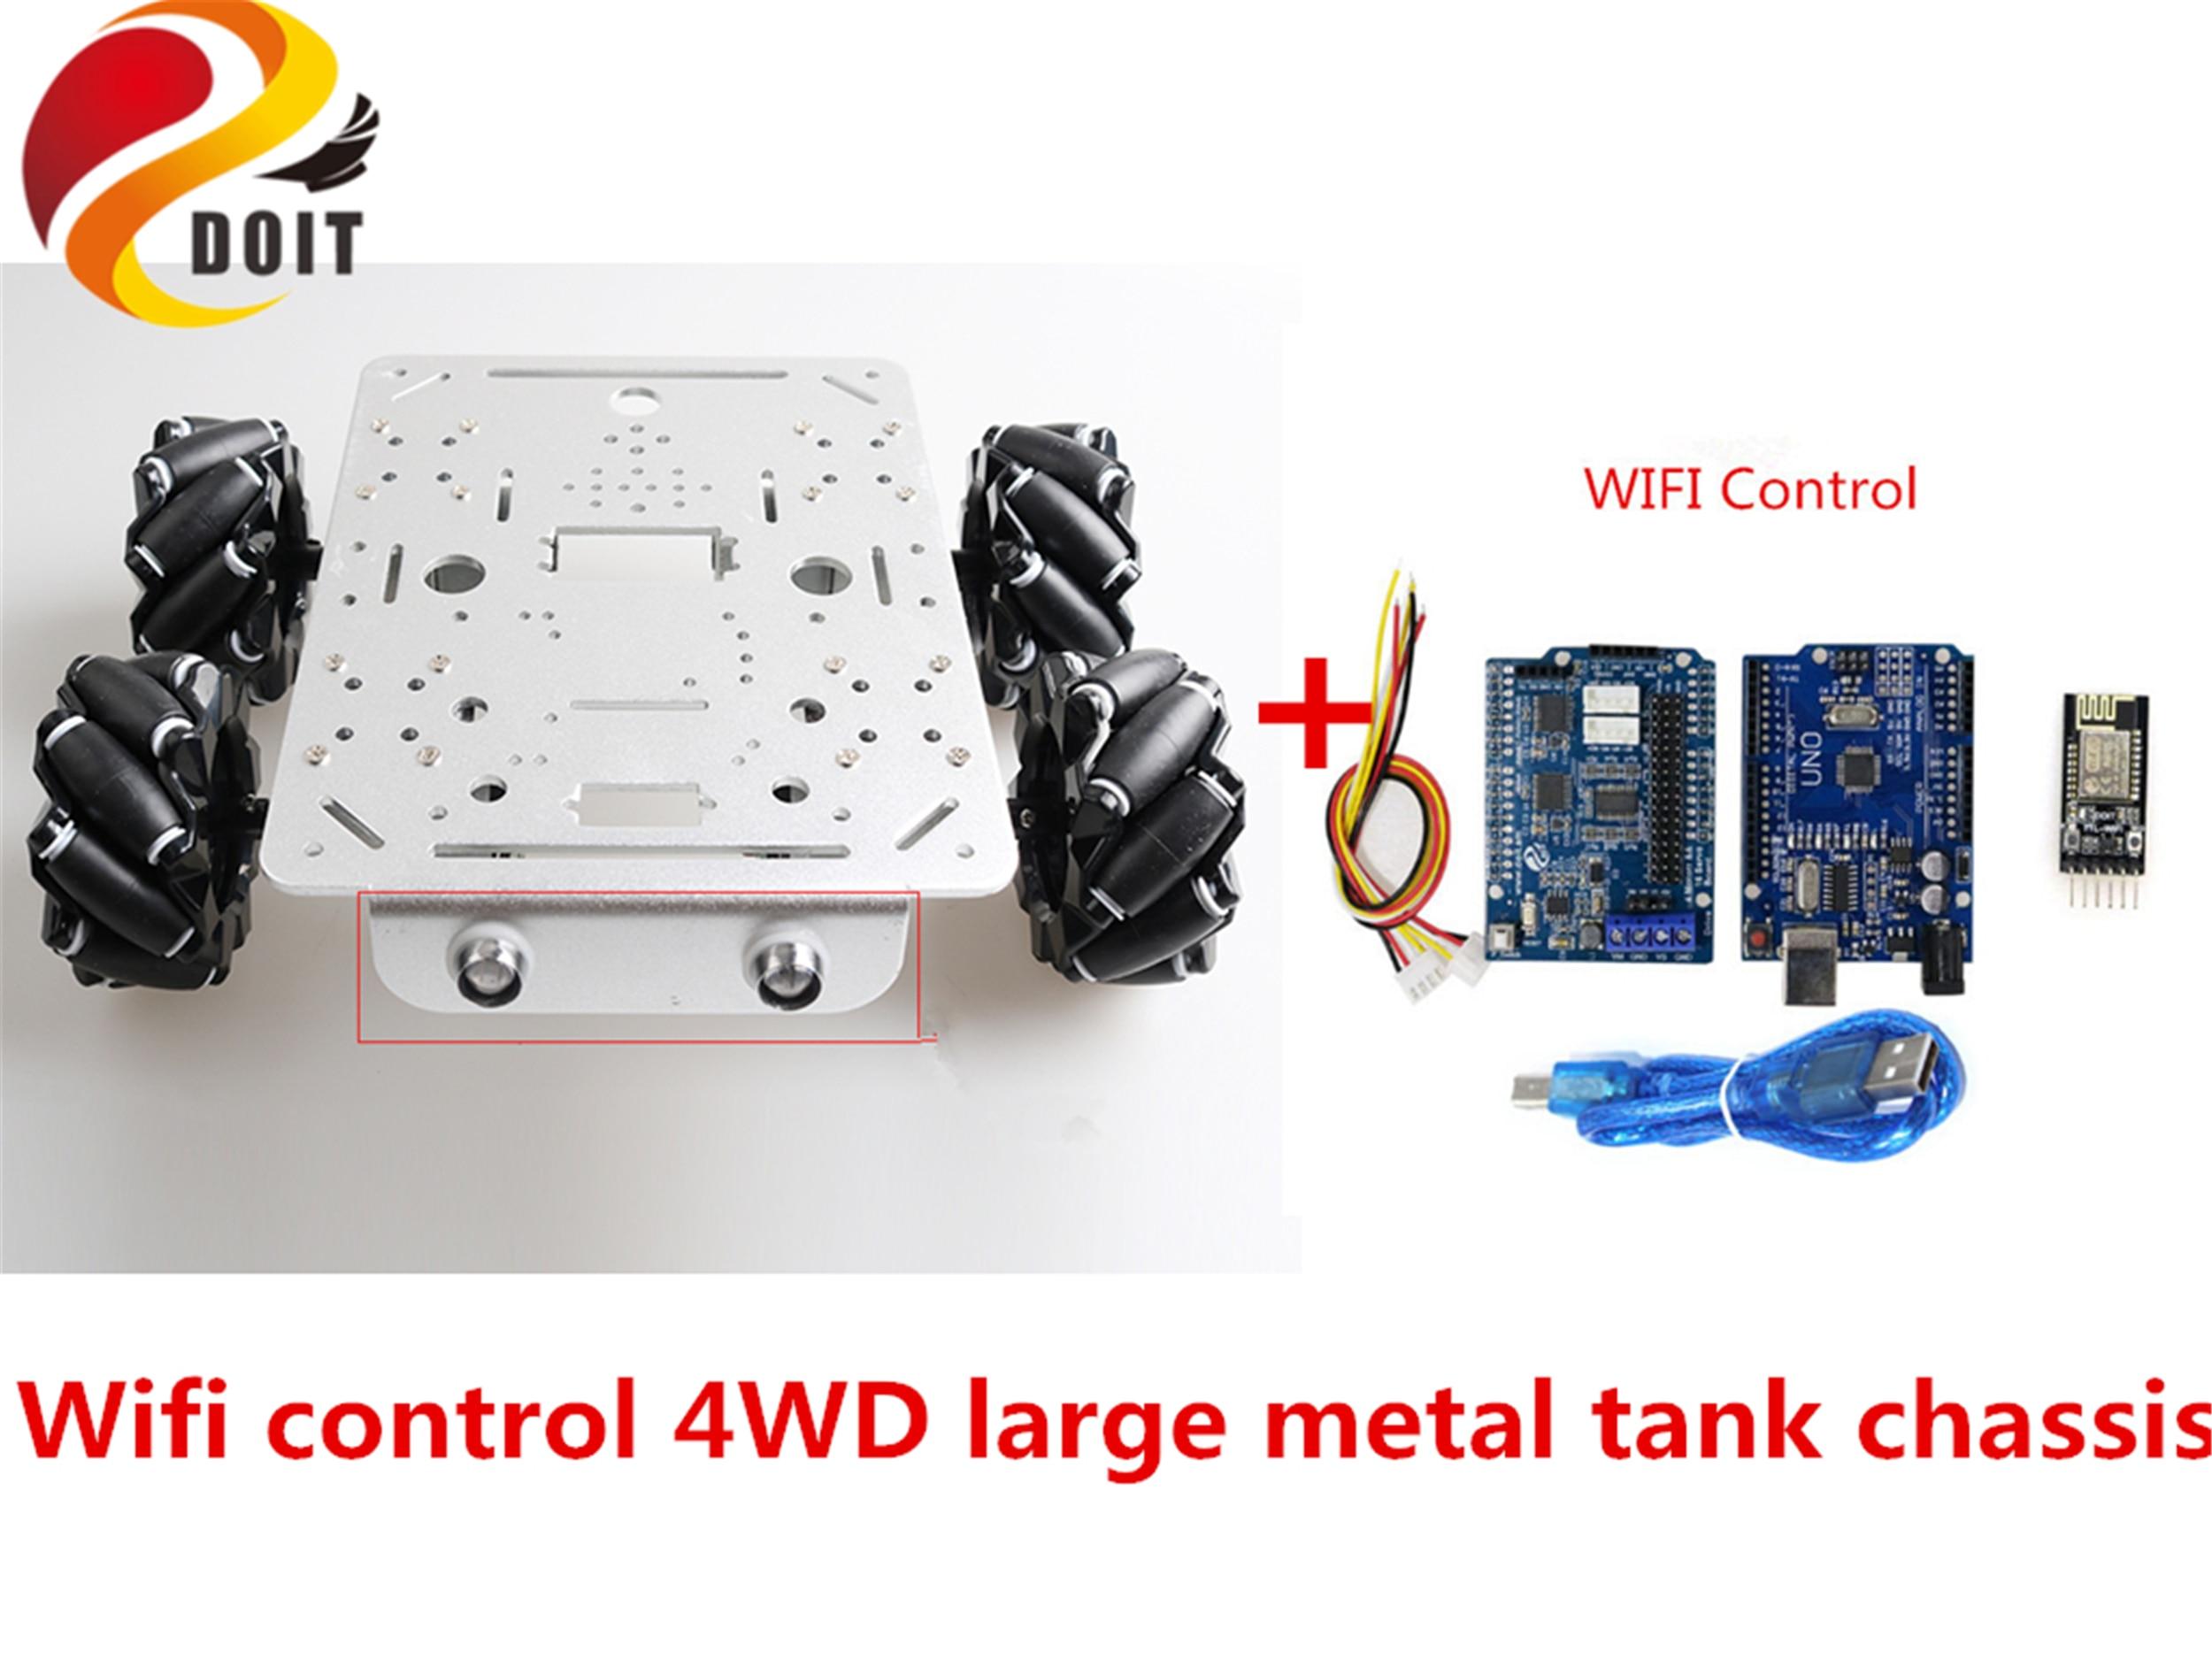 SZDOIT Wifi/Bluetooth/mango Control 4WD de Metal grande RC Robot chasis de tanque de 80mm McNammS rueda Omni DC Motor para bricolaje Arduino